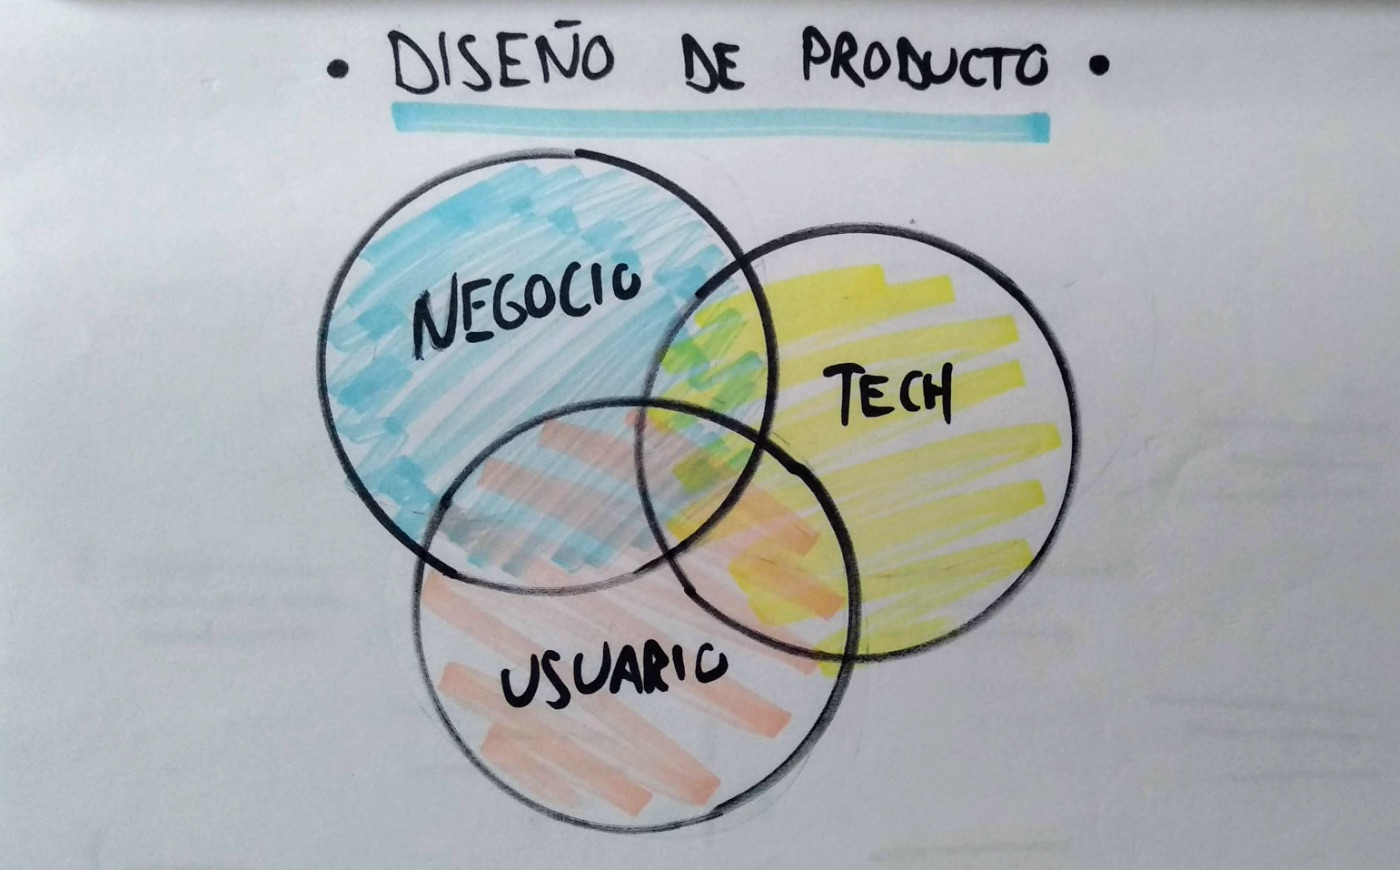 diagramas venn sobre diseño de producto: negocio, tecnología, usuario